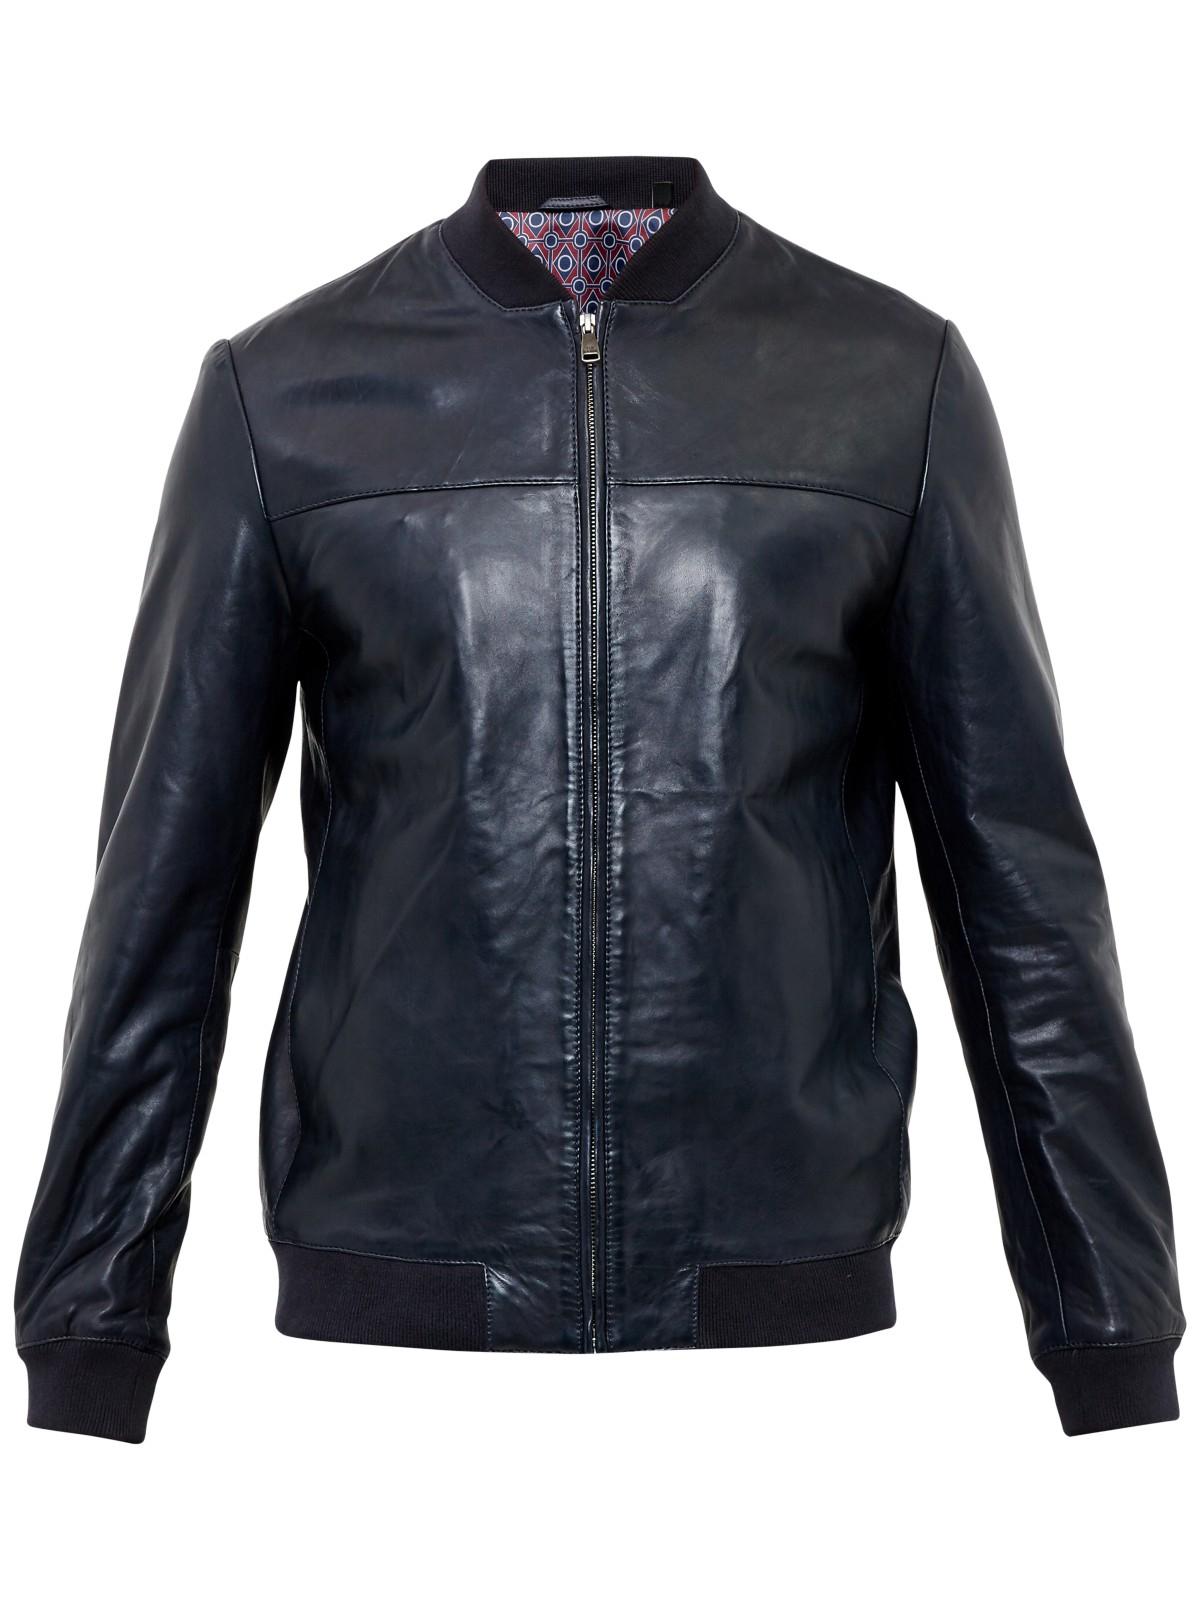 Ted Baker Action Leather Bomber Jacket in Navy (Blue) for Men